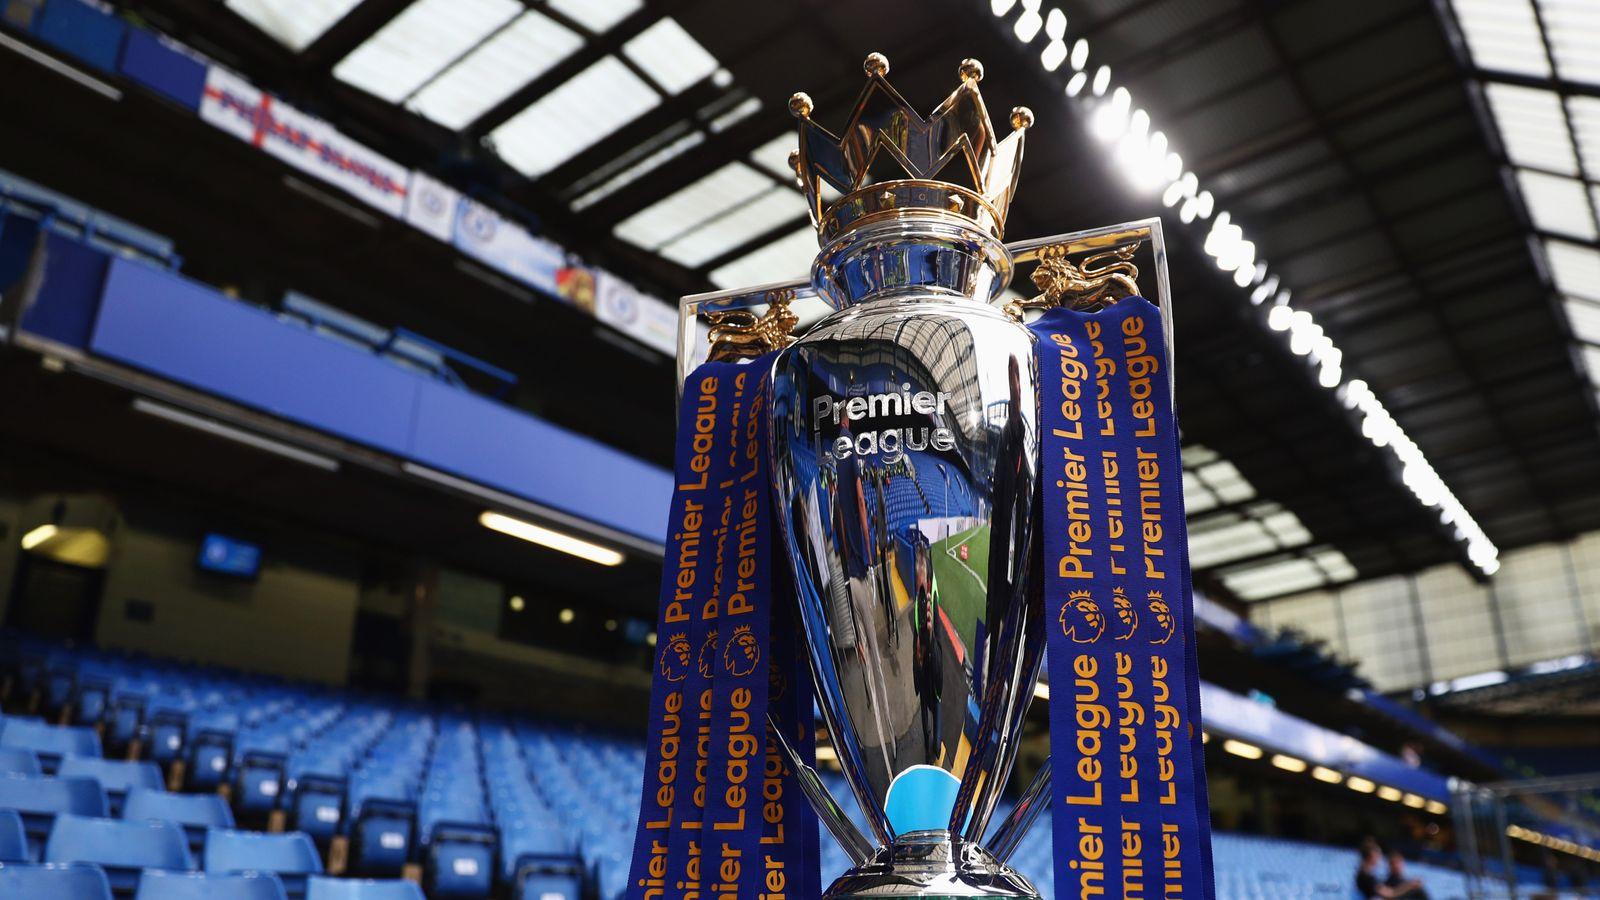 Setting you up for the Premier League season